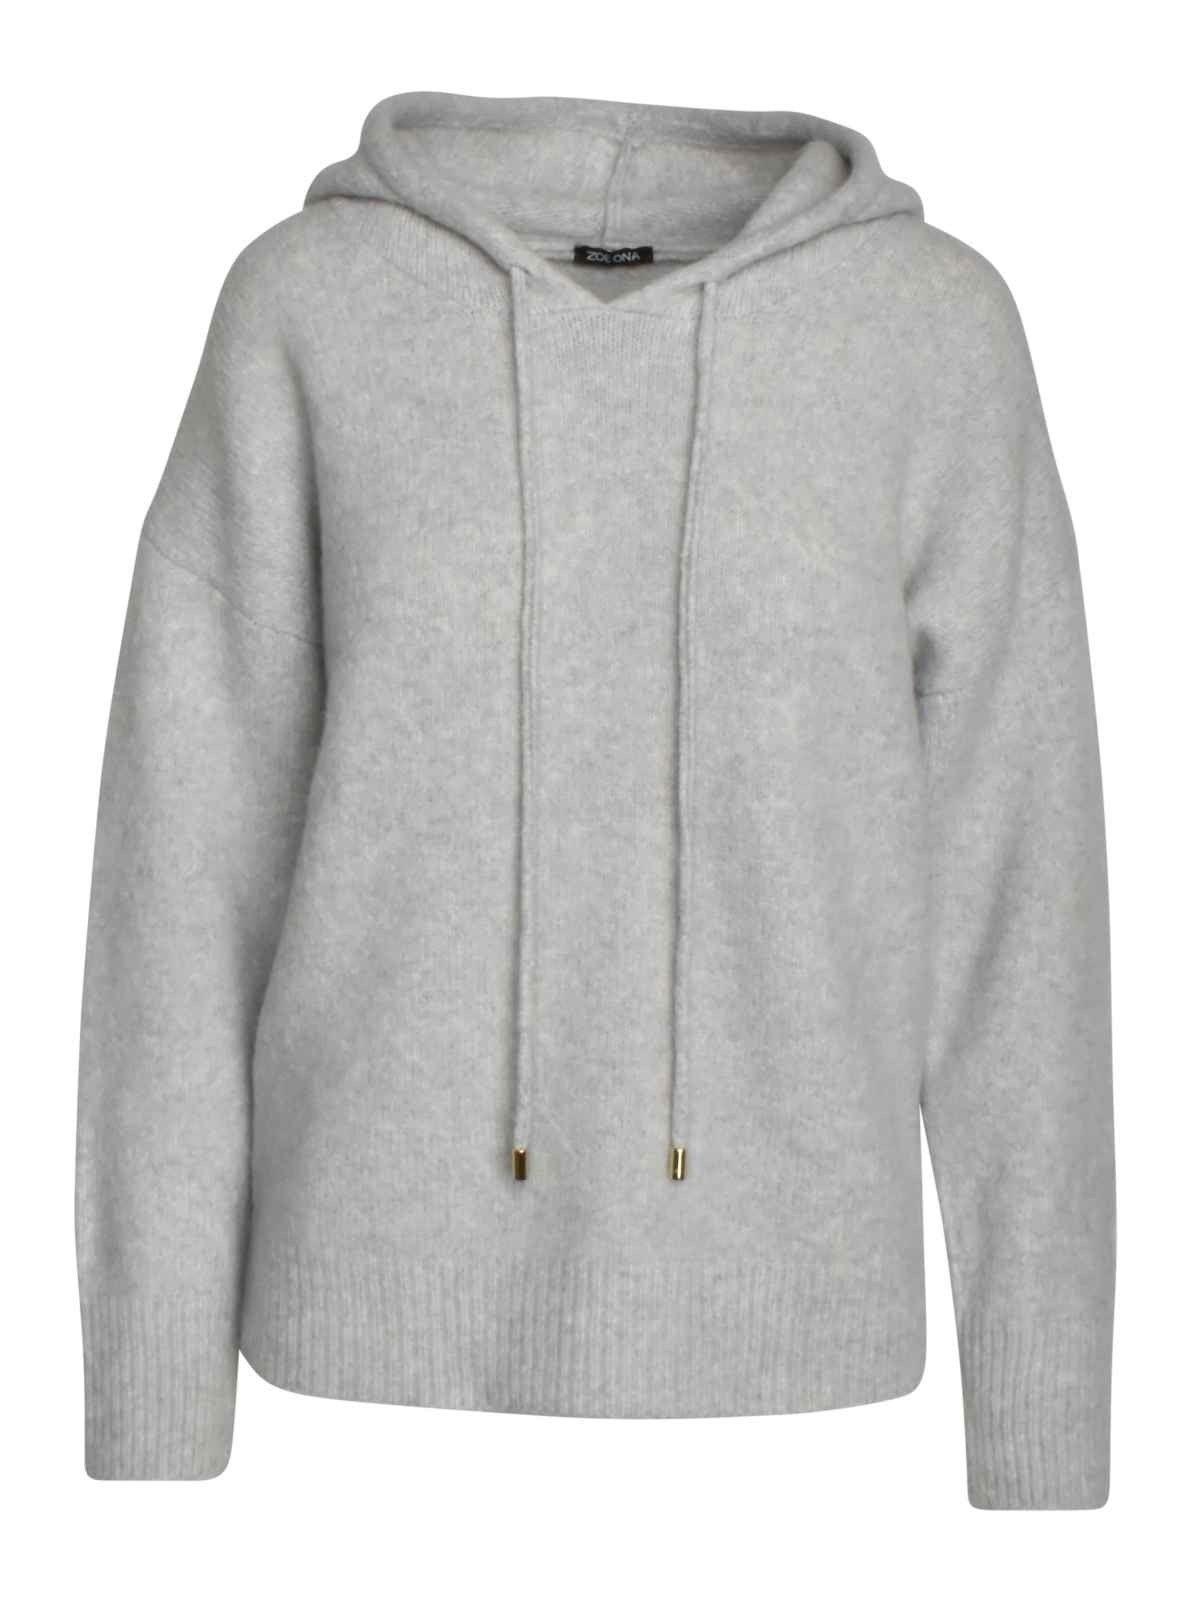 ZOE ONA - Damen Sweater - Kapuzen Sweater - Light Grey